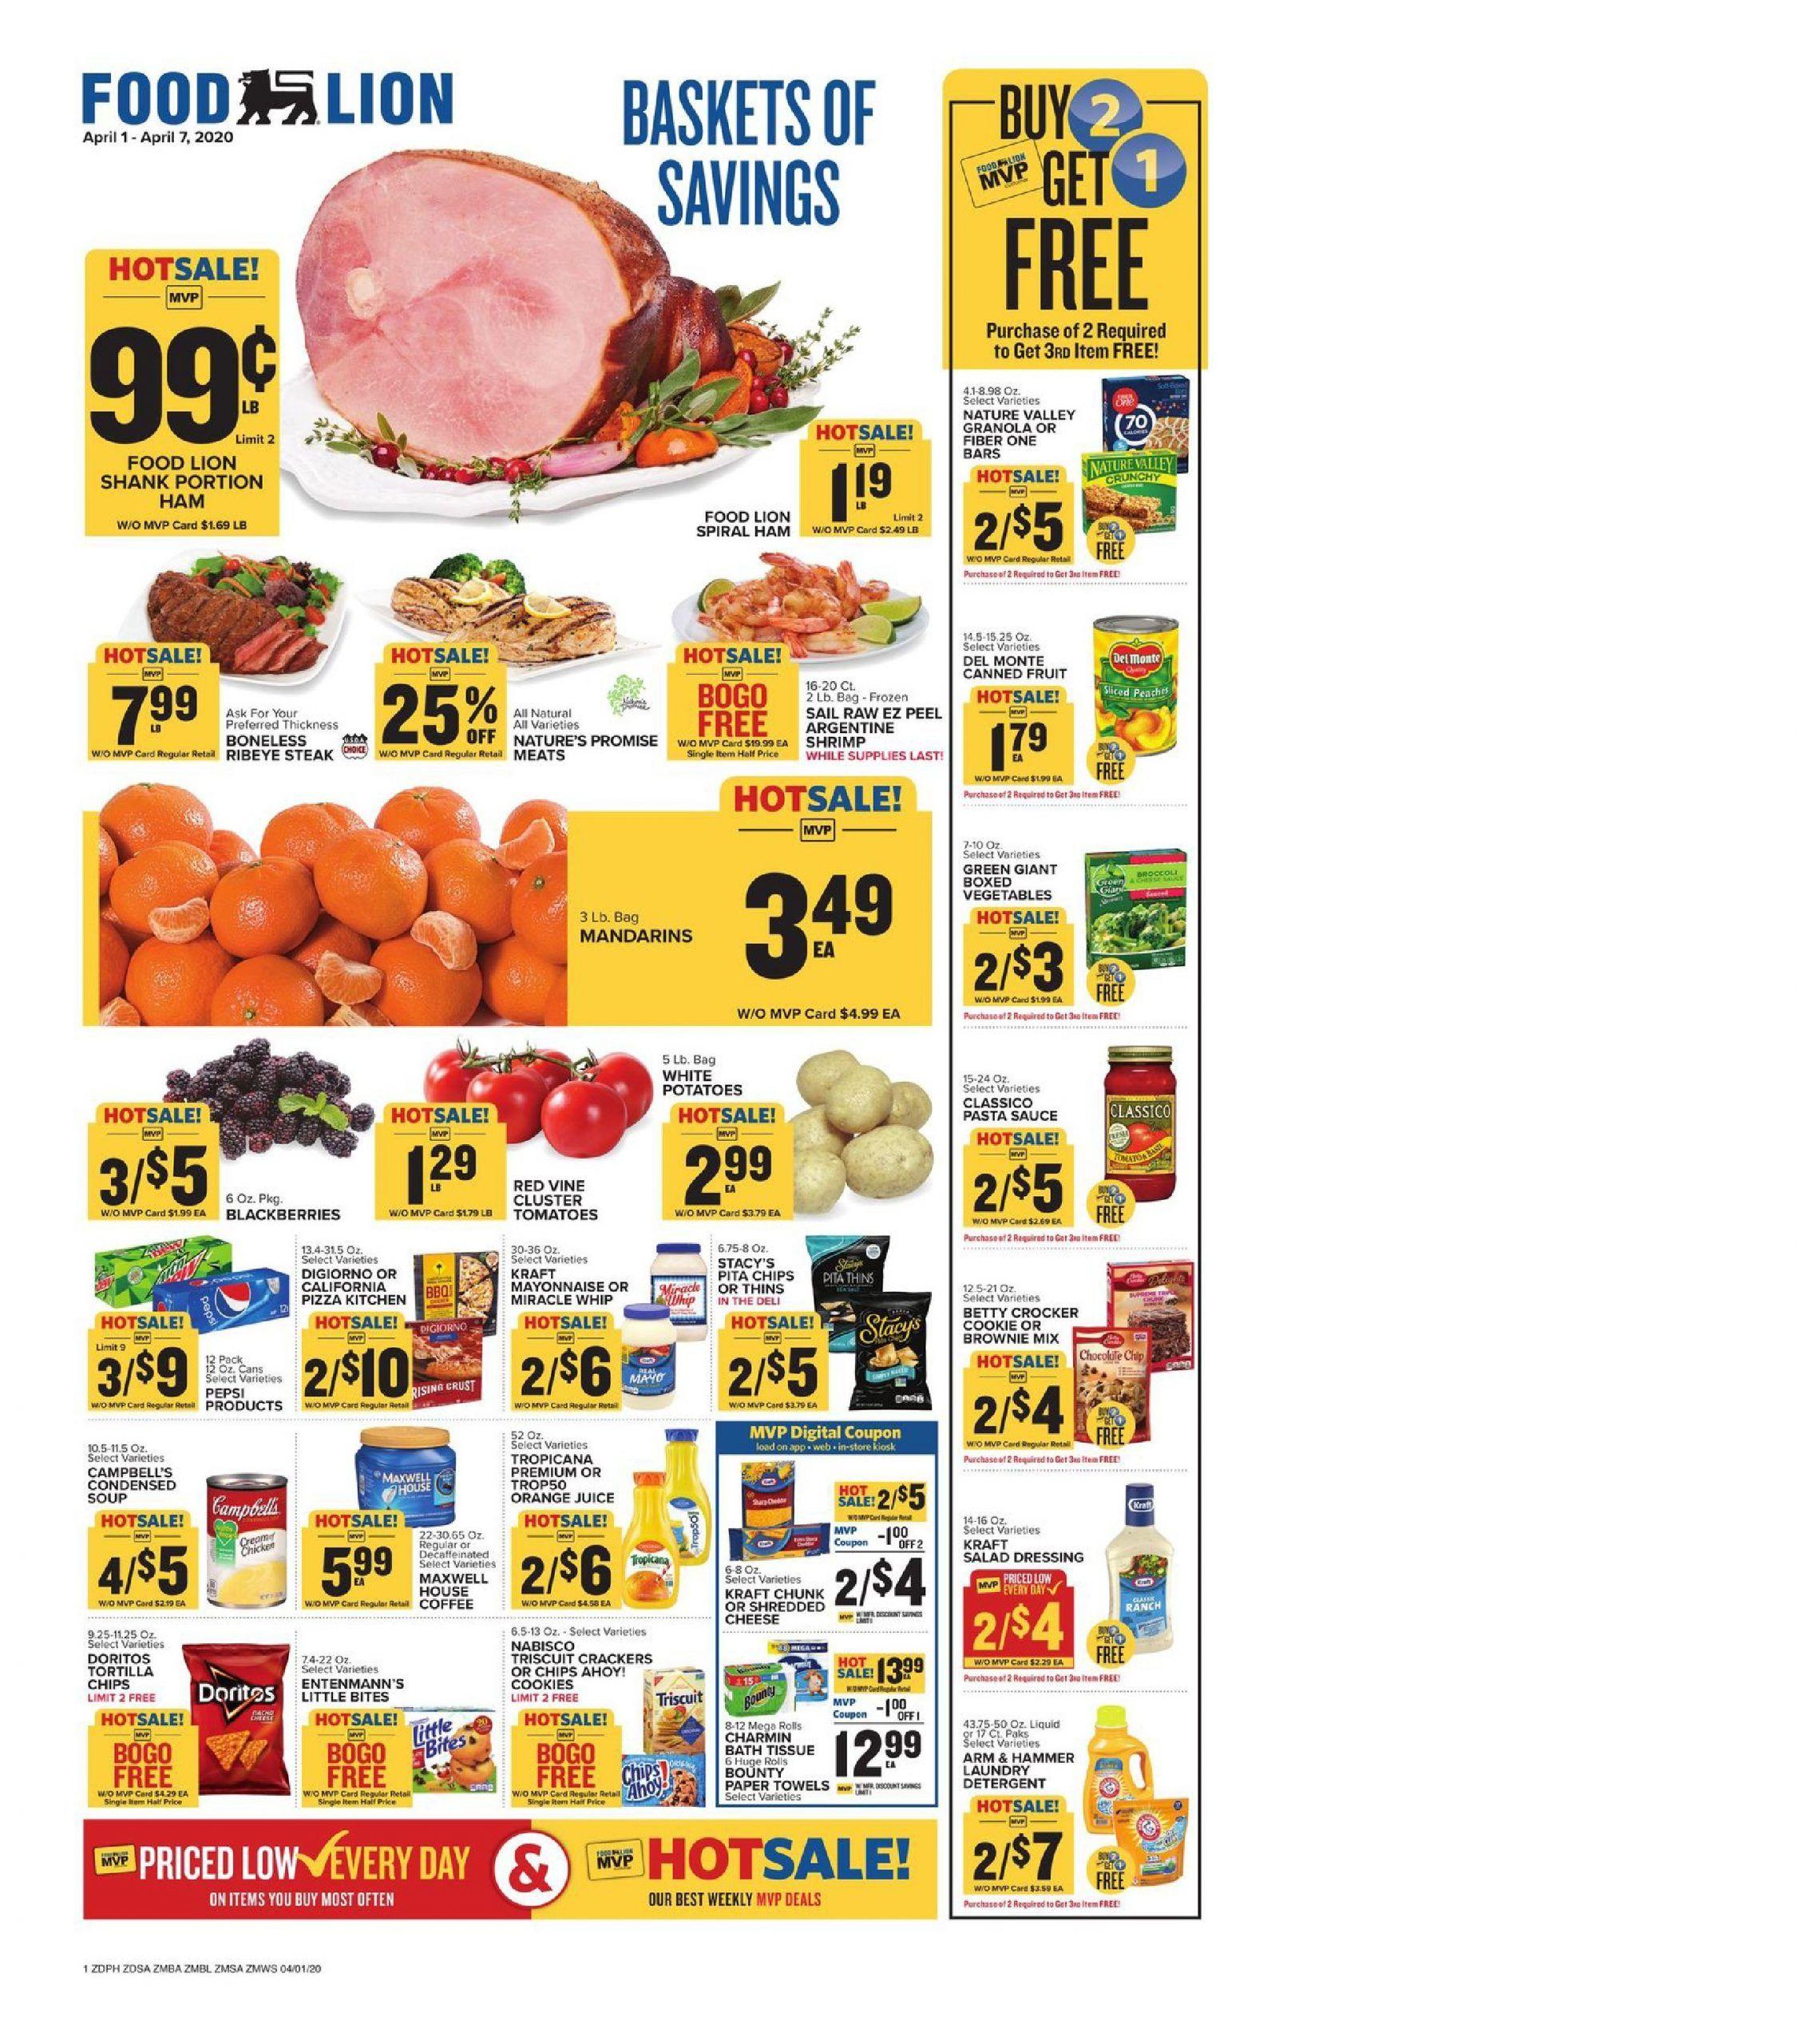 Food lion weekly ad apr 1 apr 7 2020 sneak peek preview